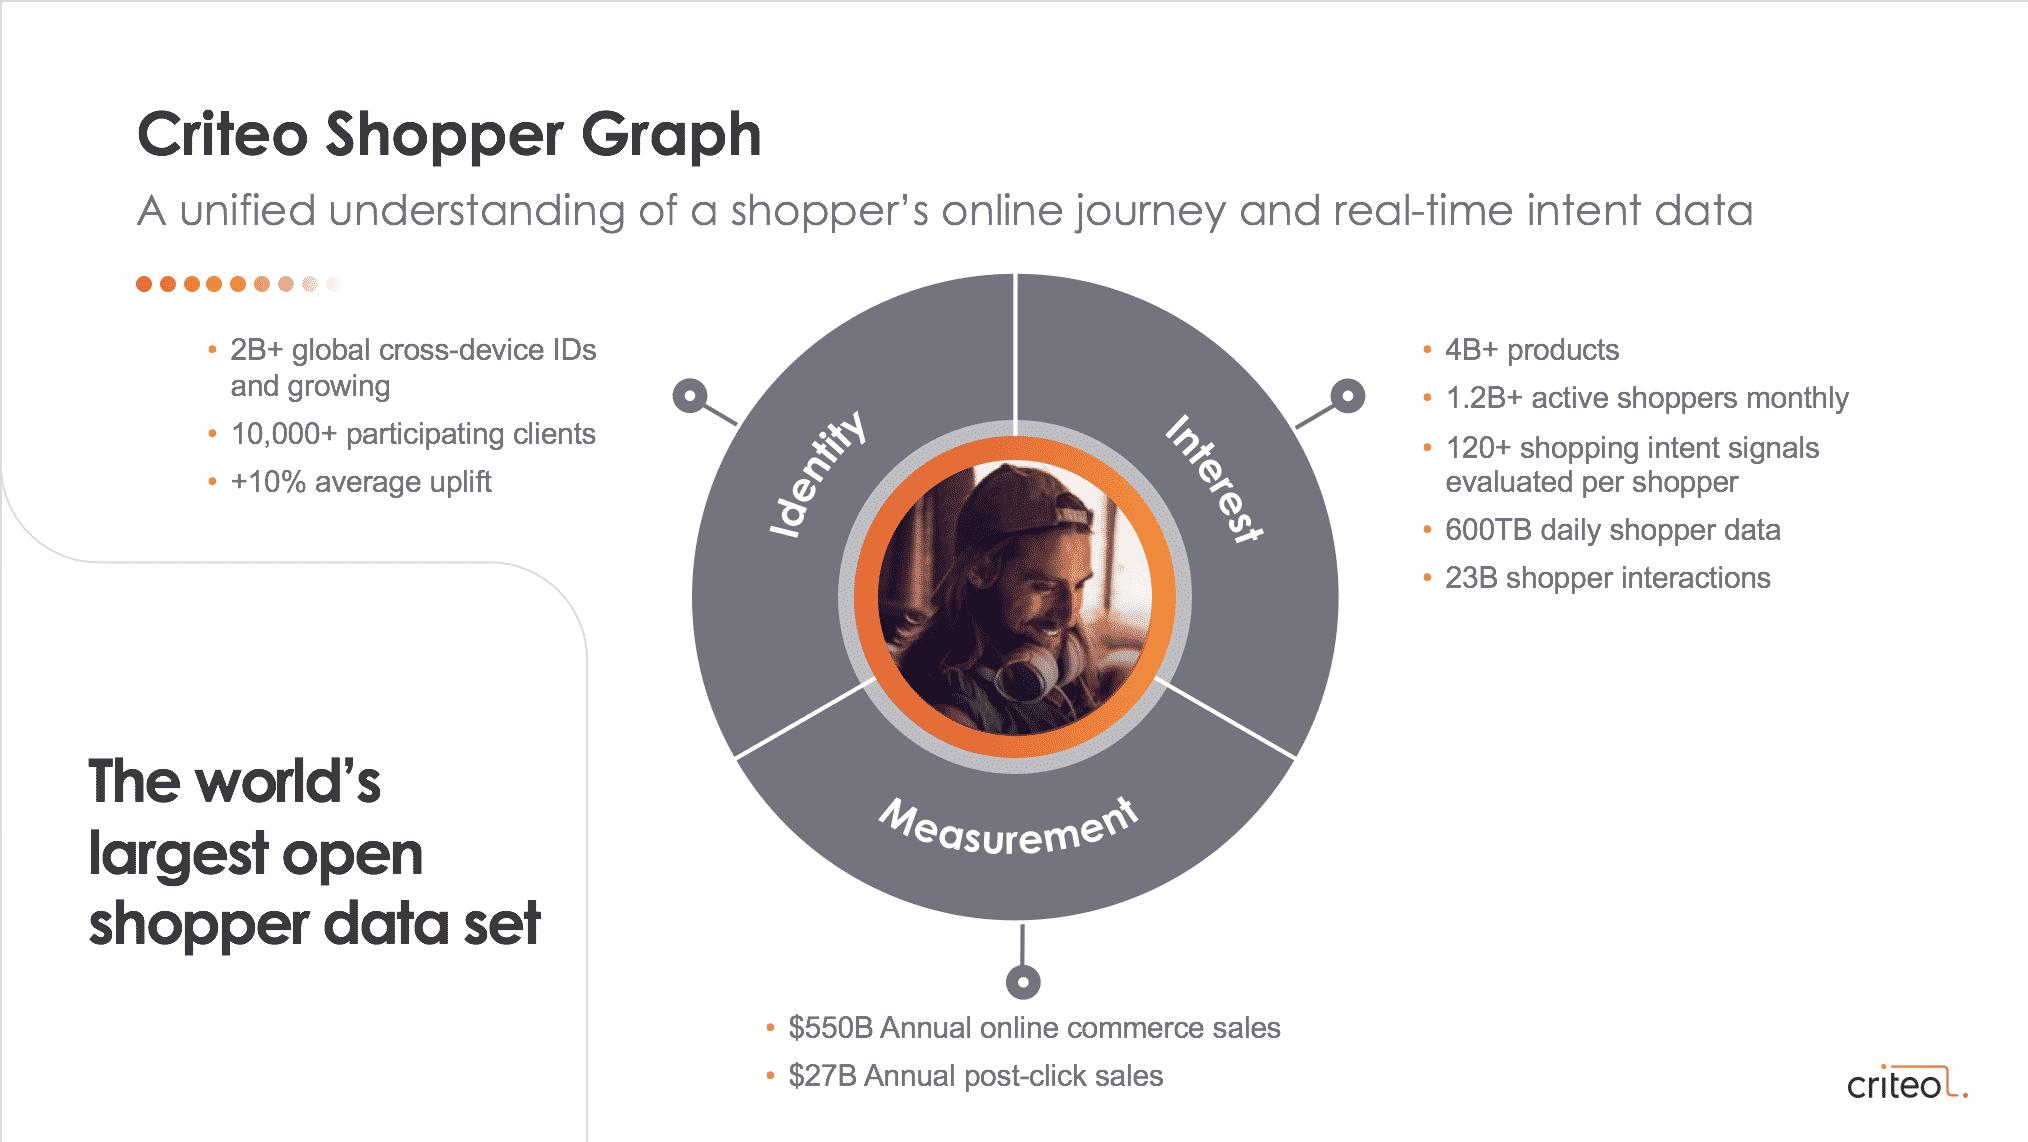 Criteo Shopper Graph